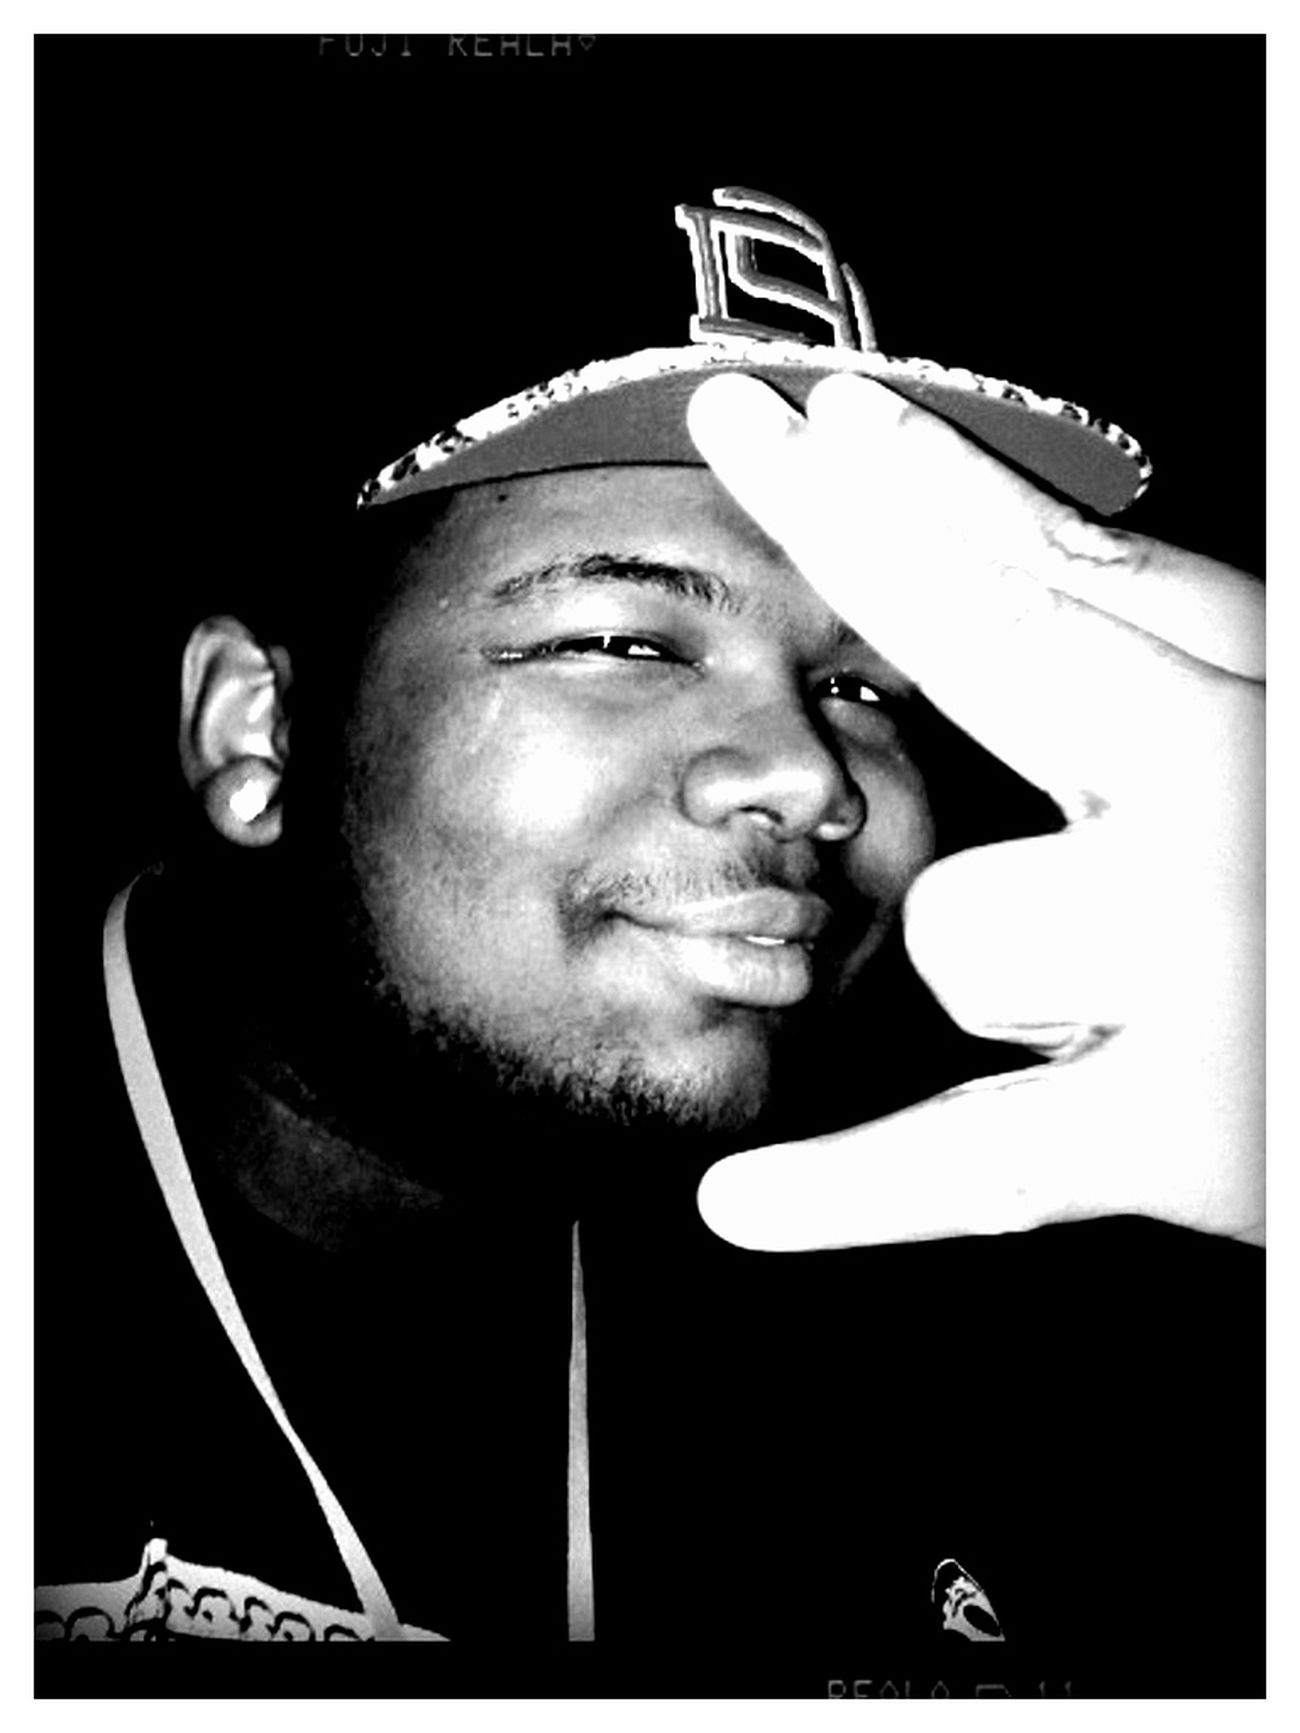 King Jay Swavey